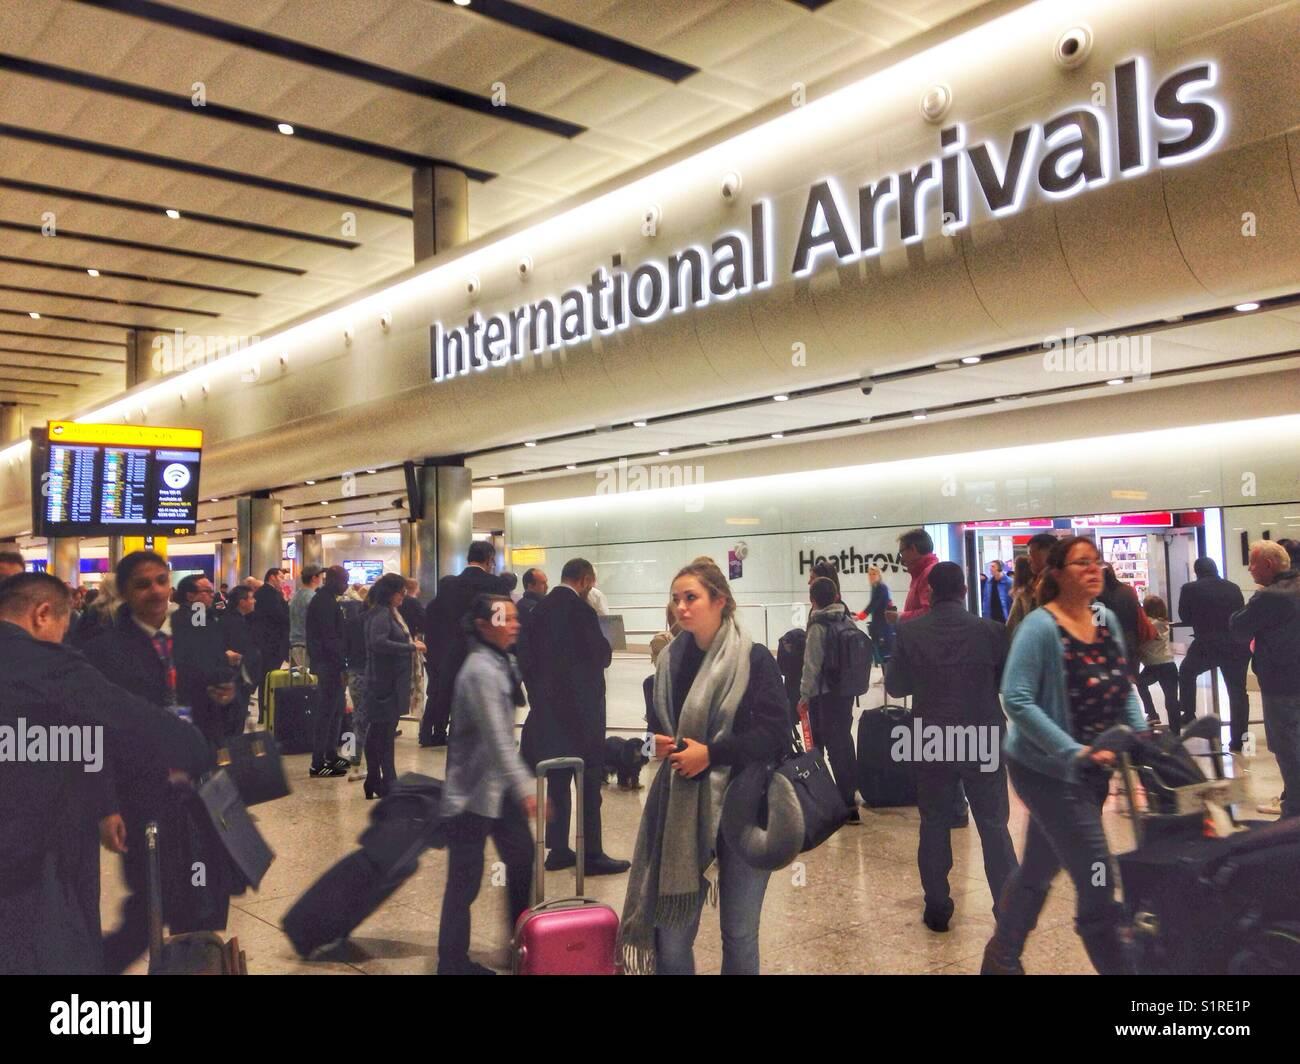 International Arrivals at Heathrow Airport, terminal 2 Stock Photo - Alamy